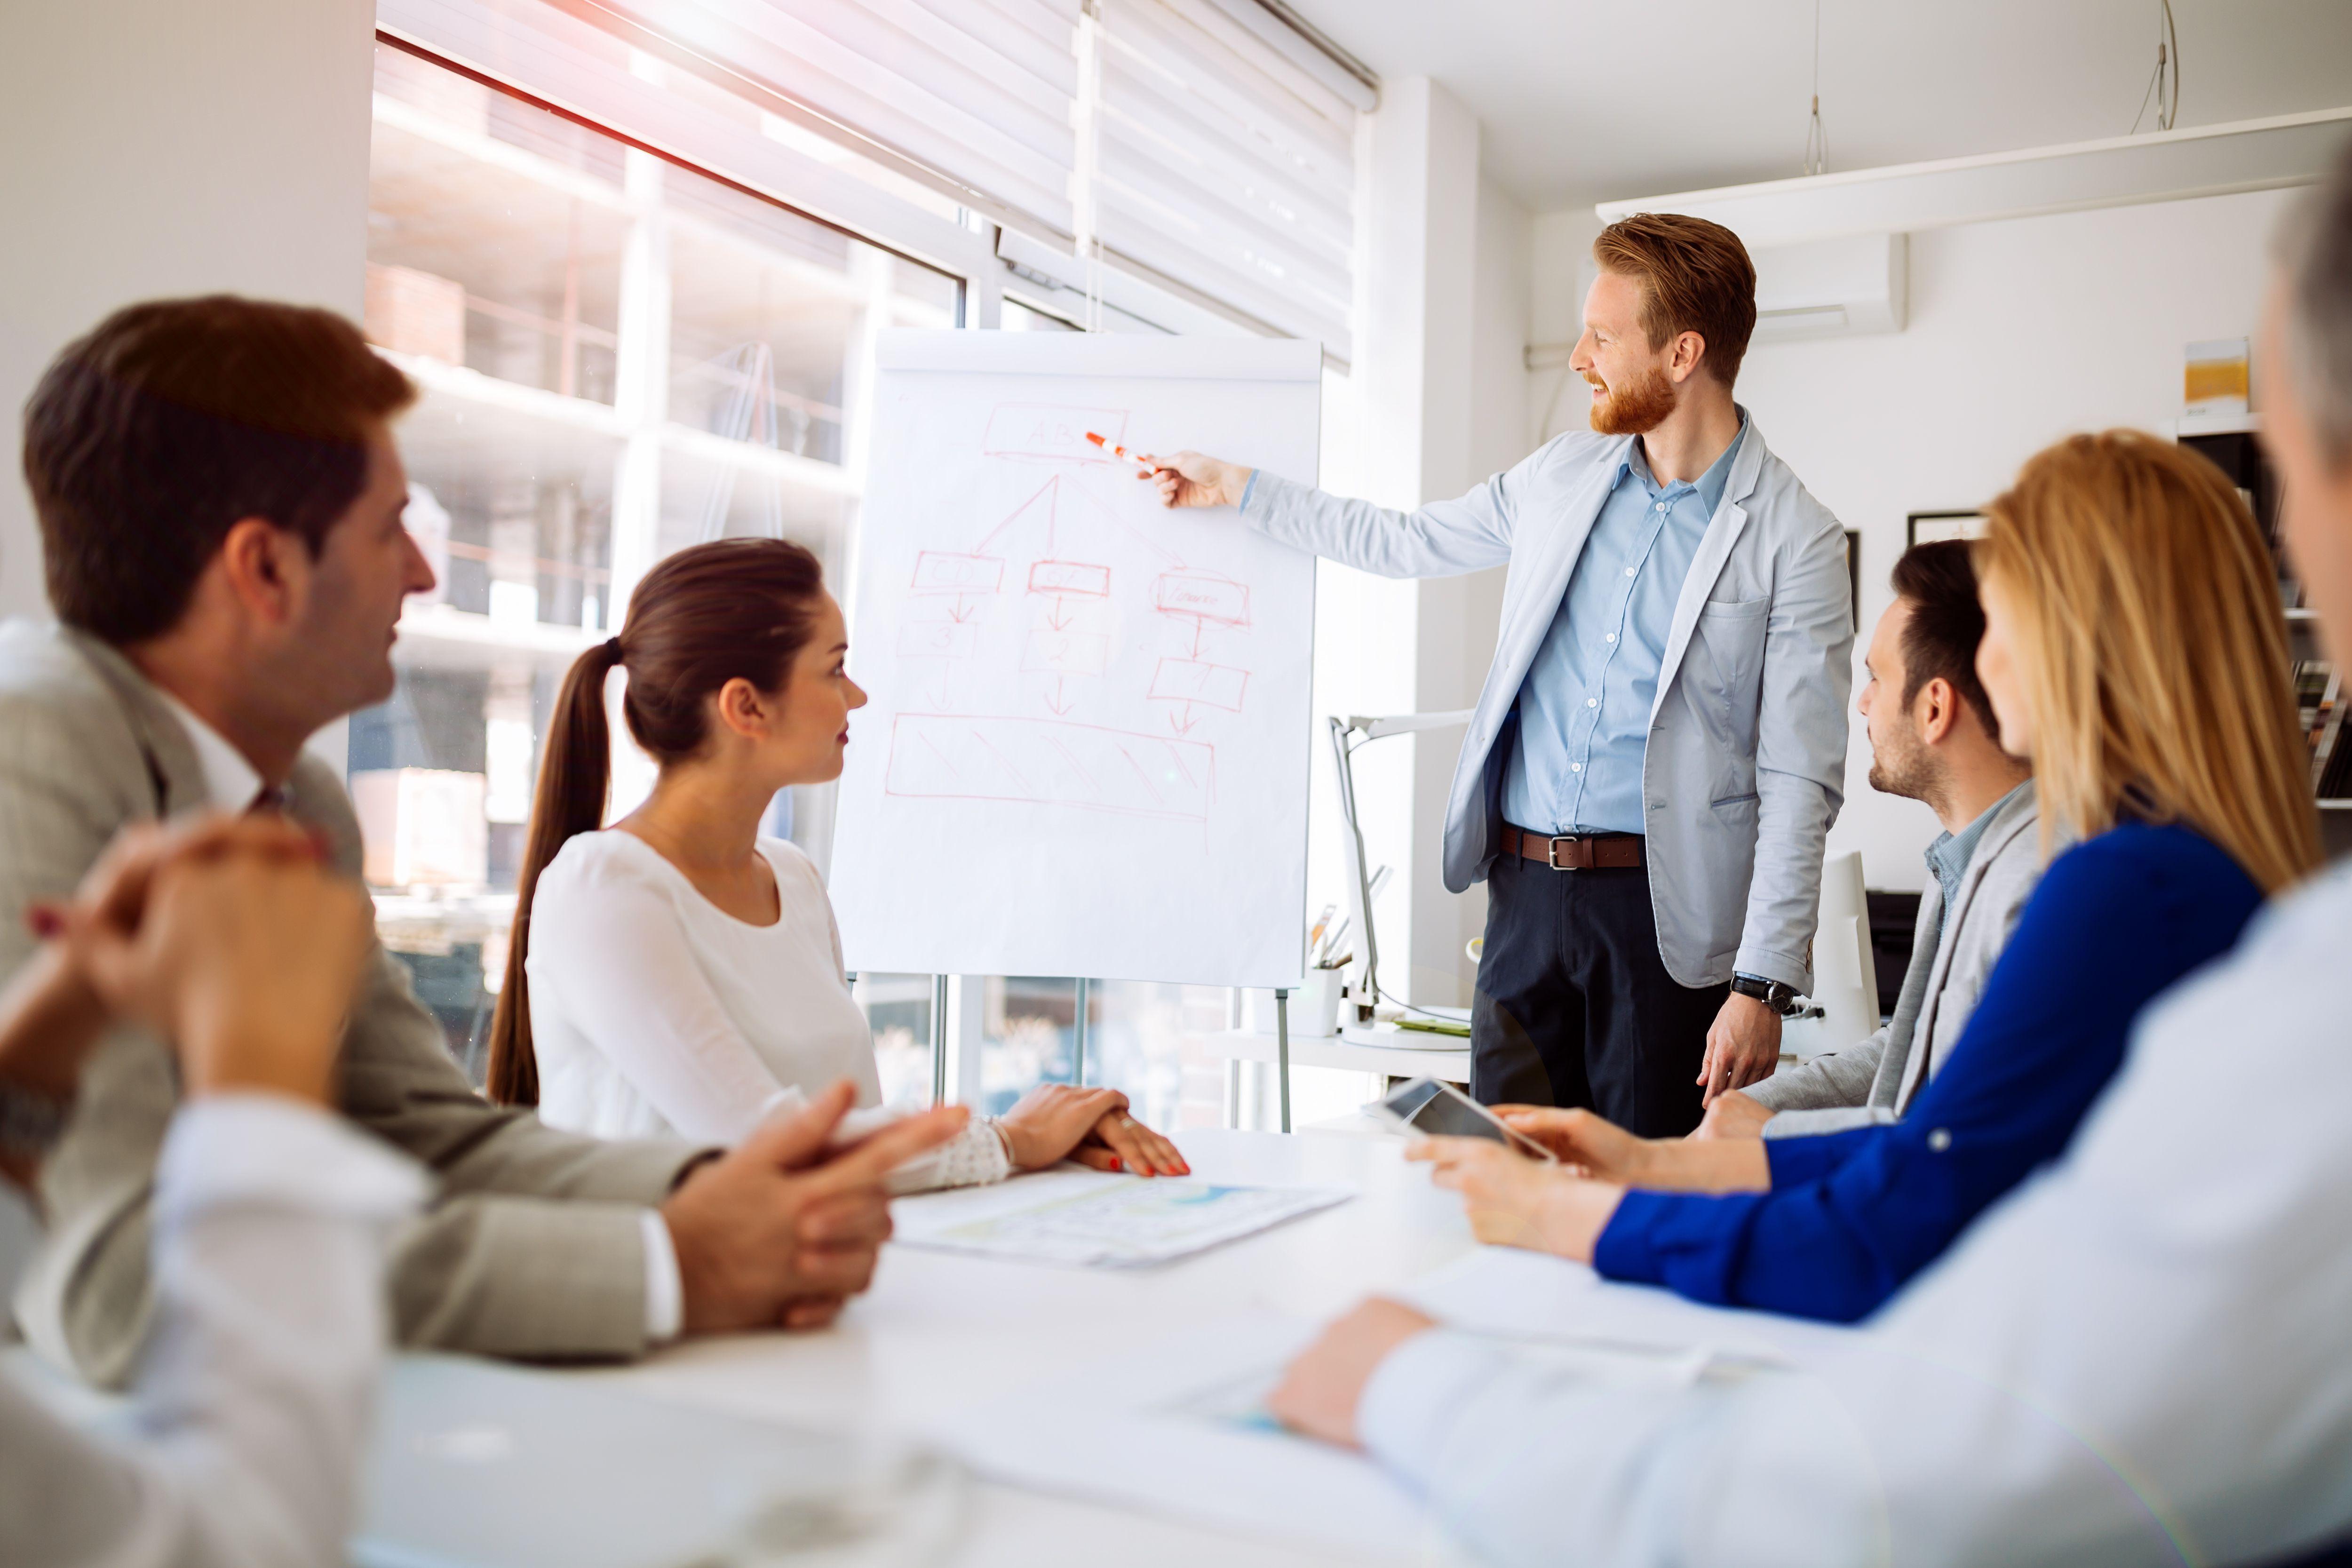 Cursos de inglés para empresas en Caldes de Montbui